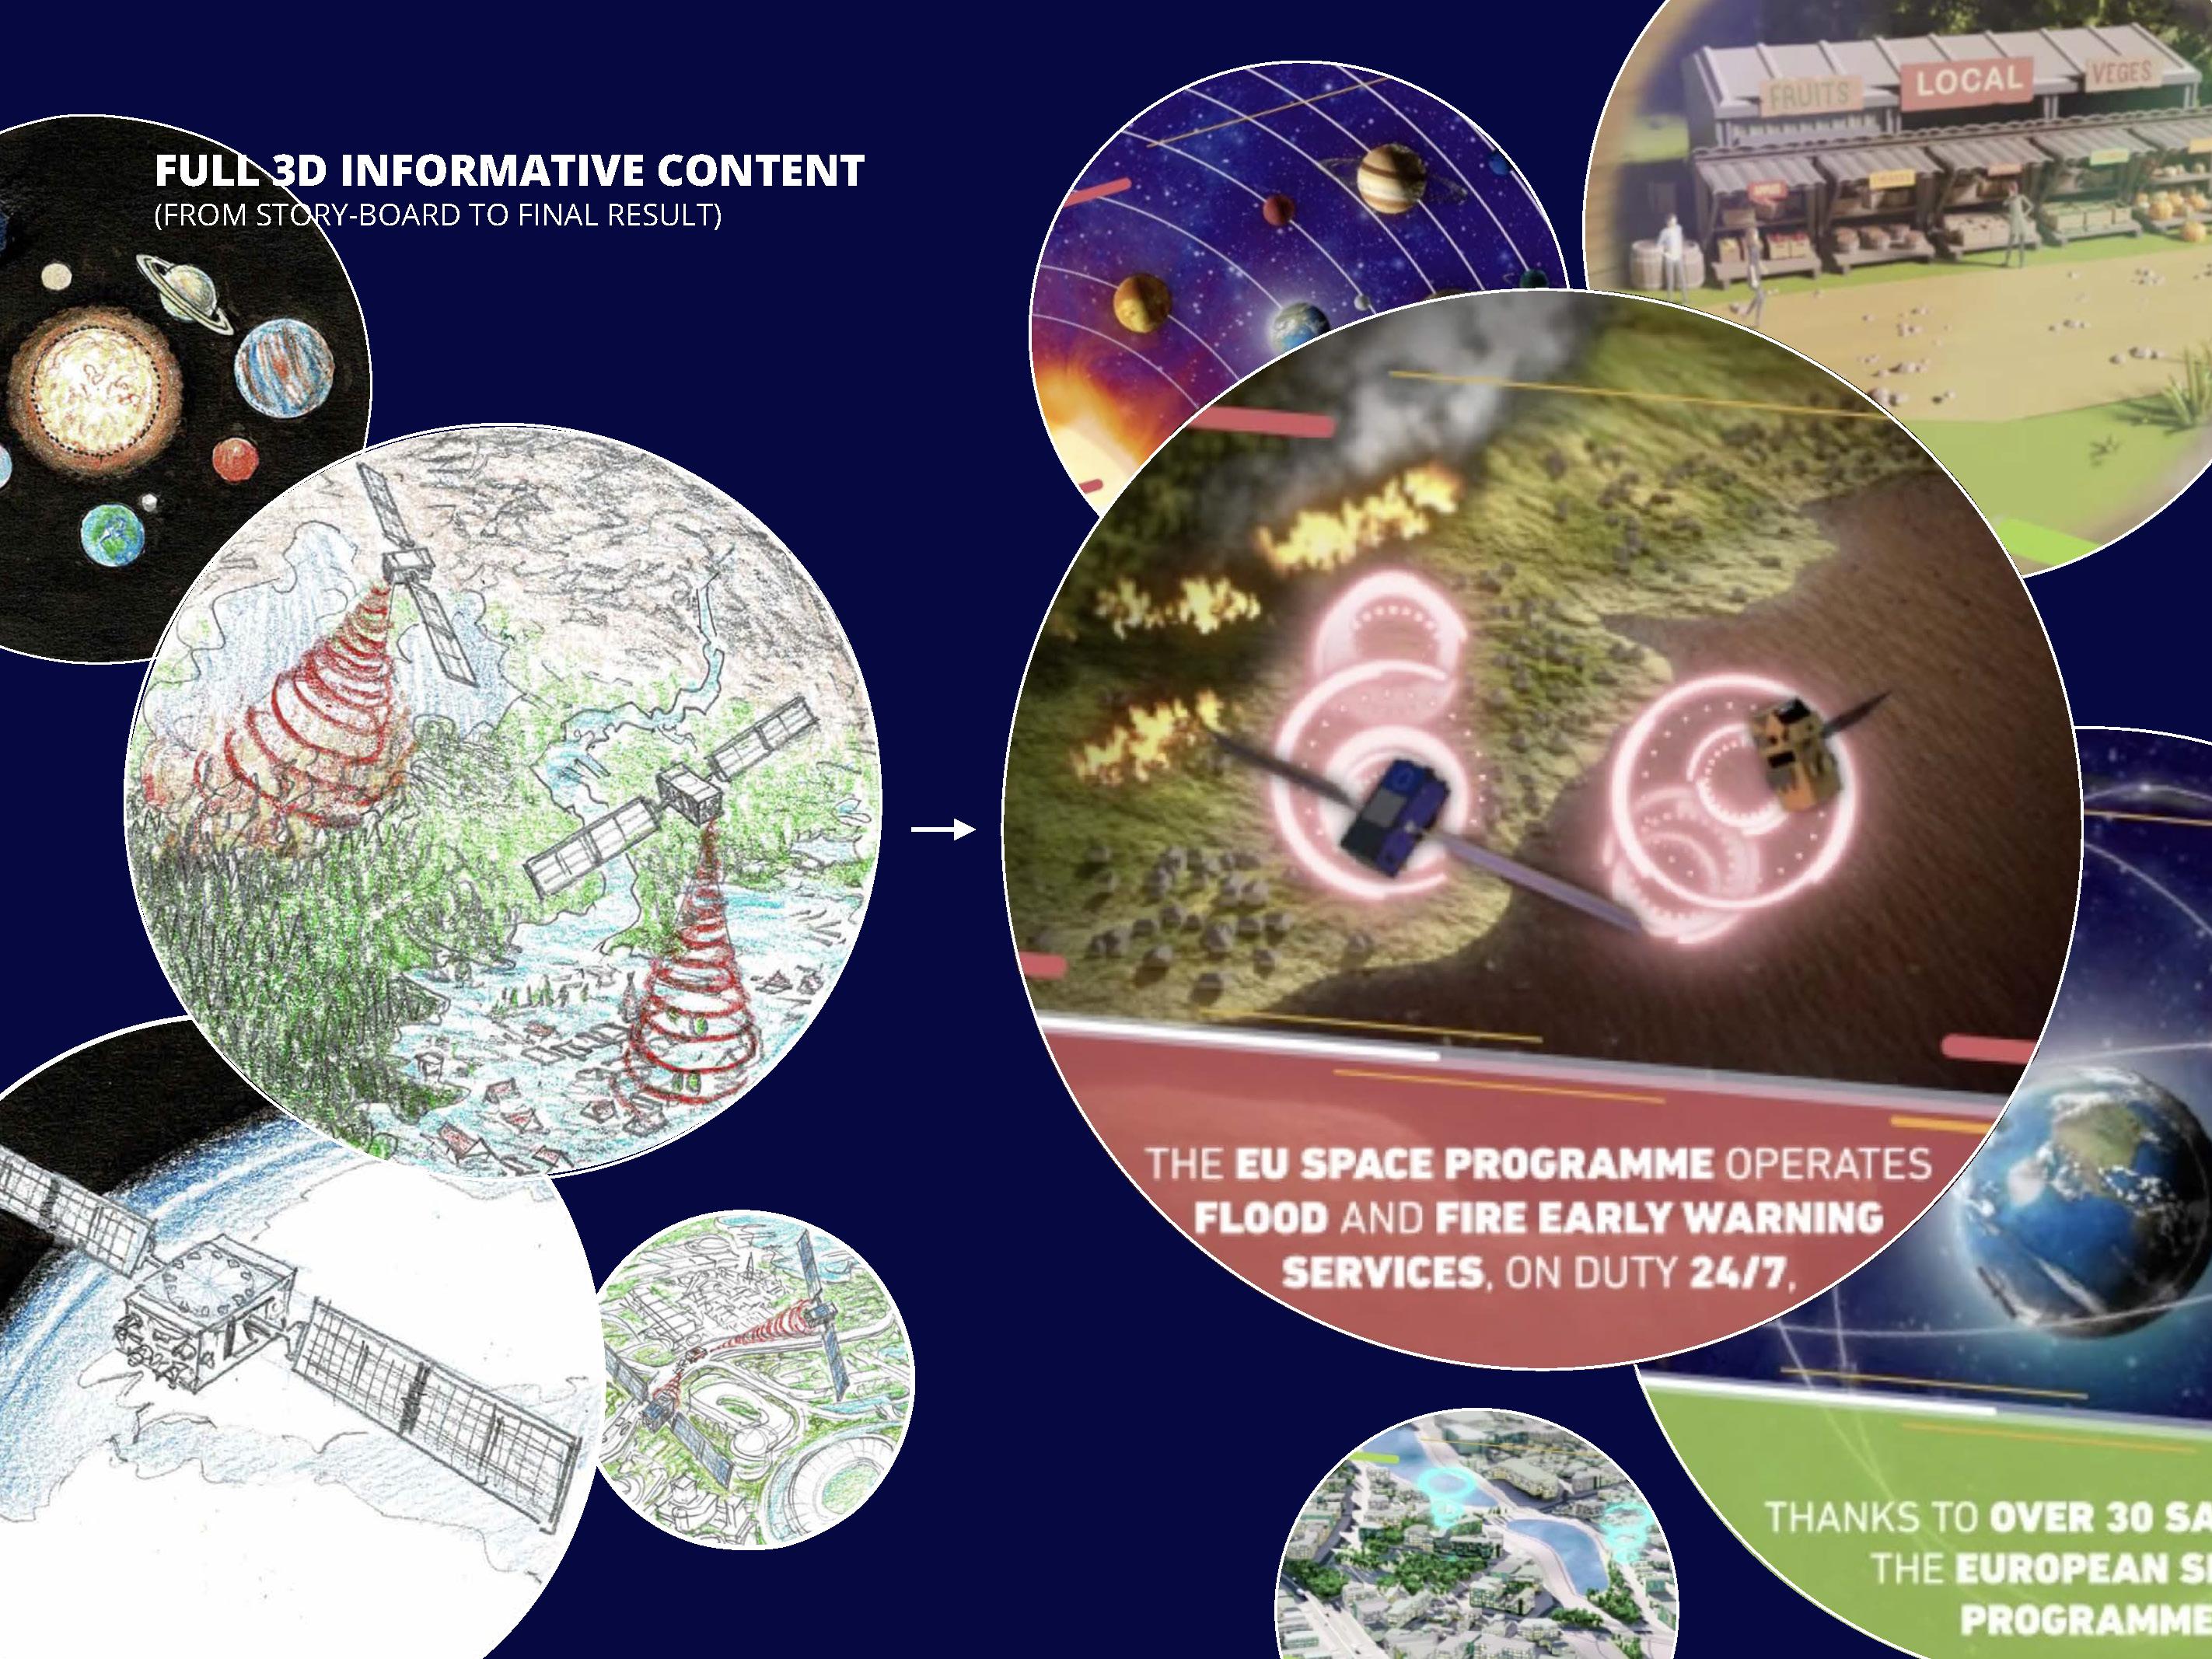 Galileo et Copericus EU SPACE Programs - Film